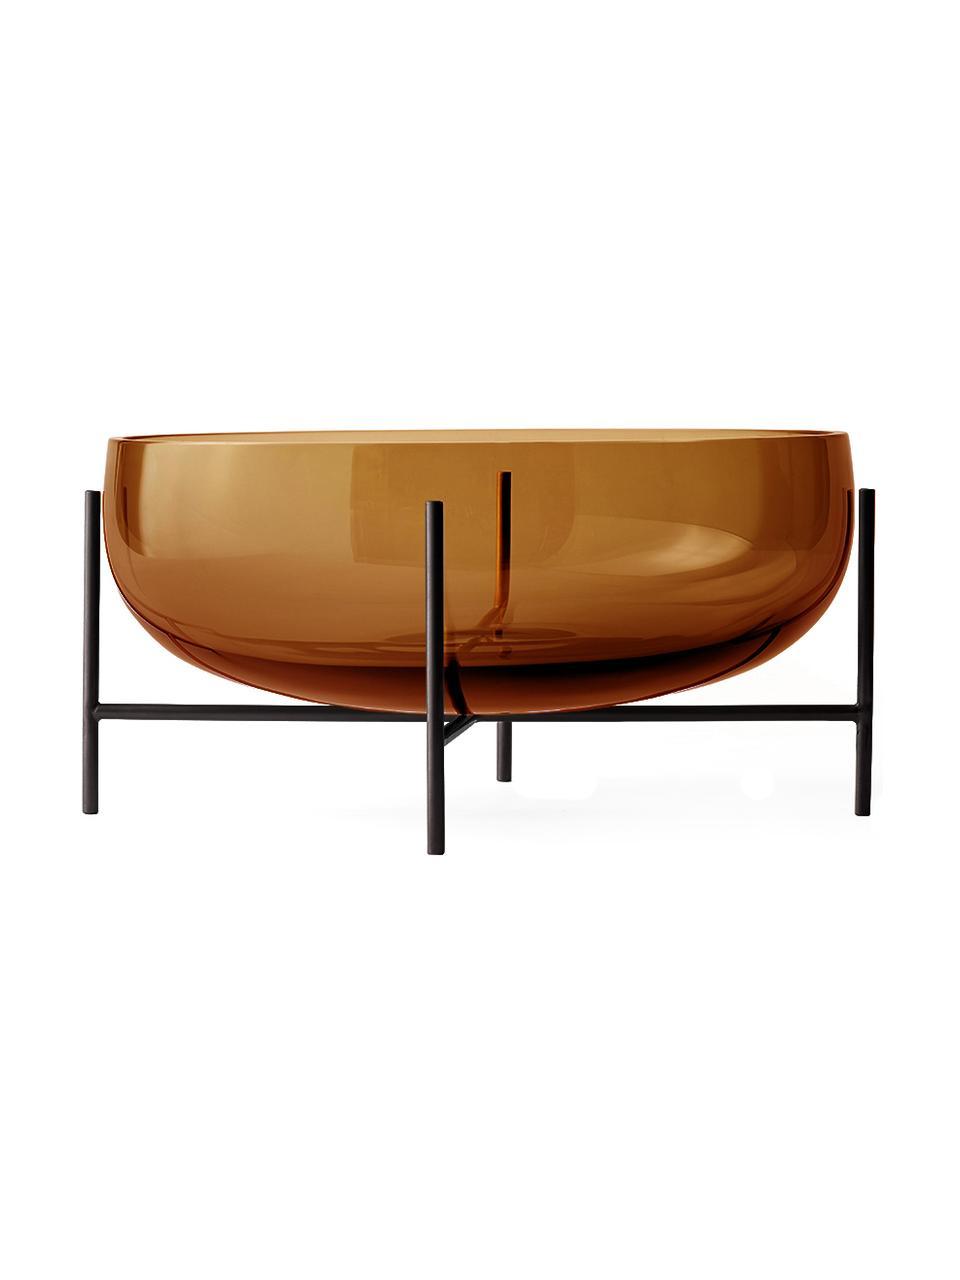 Bol Échasse, Jarrón: vidrio soplado artesanalm, Estructura: latón, Marrón, Ø 30 x Al 14 cm